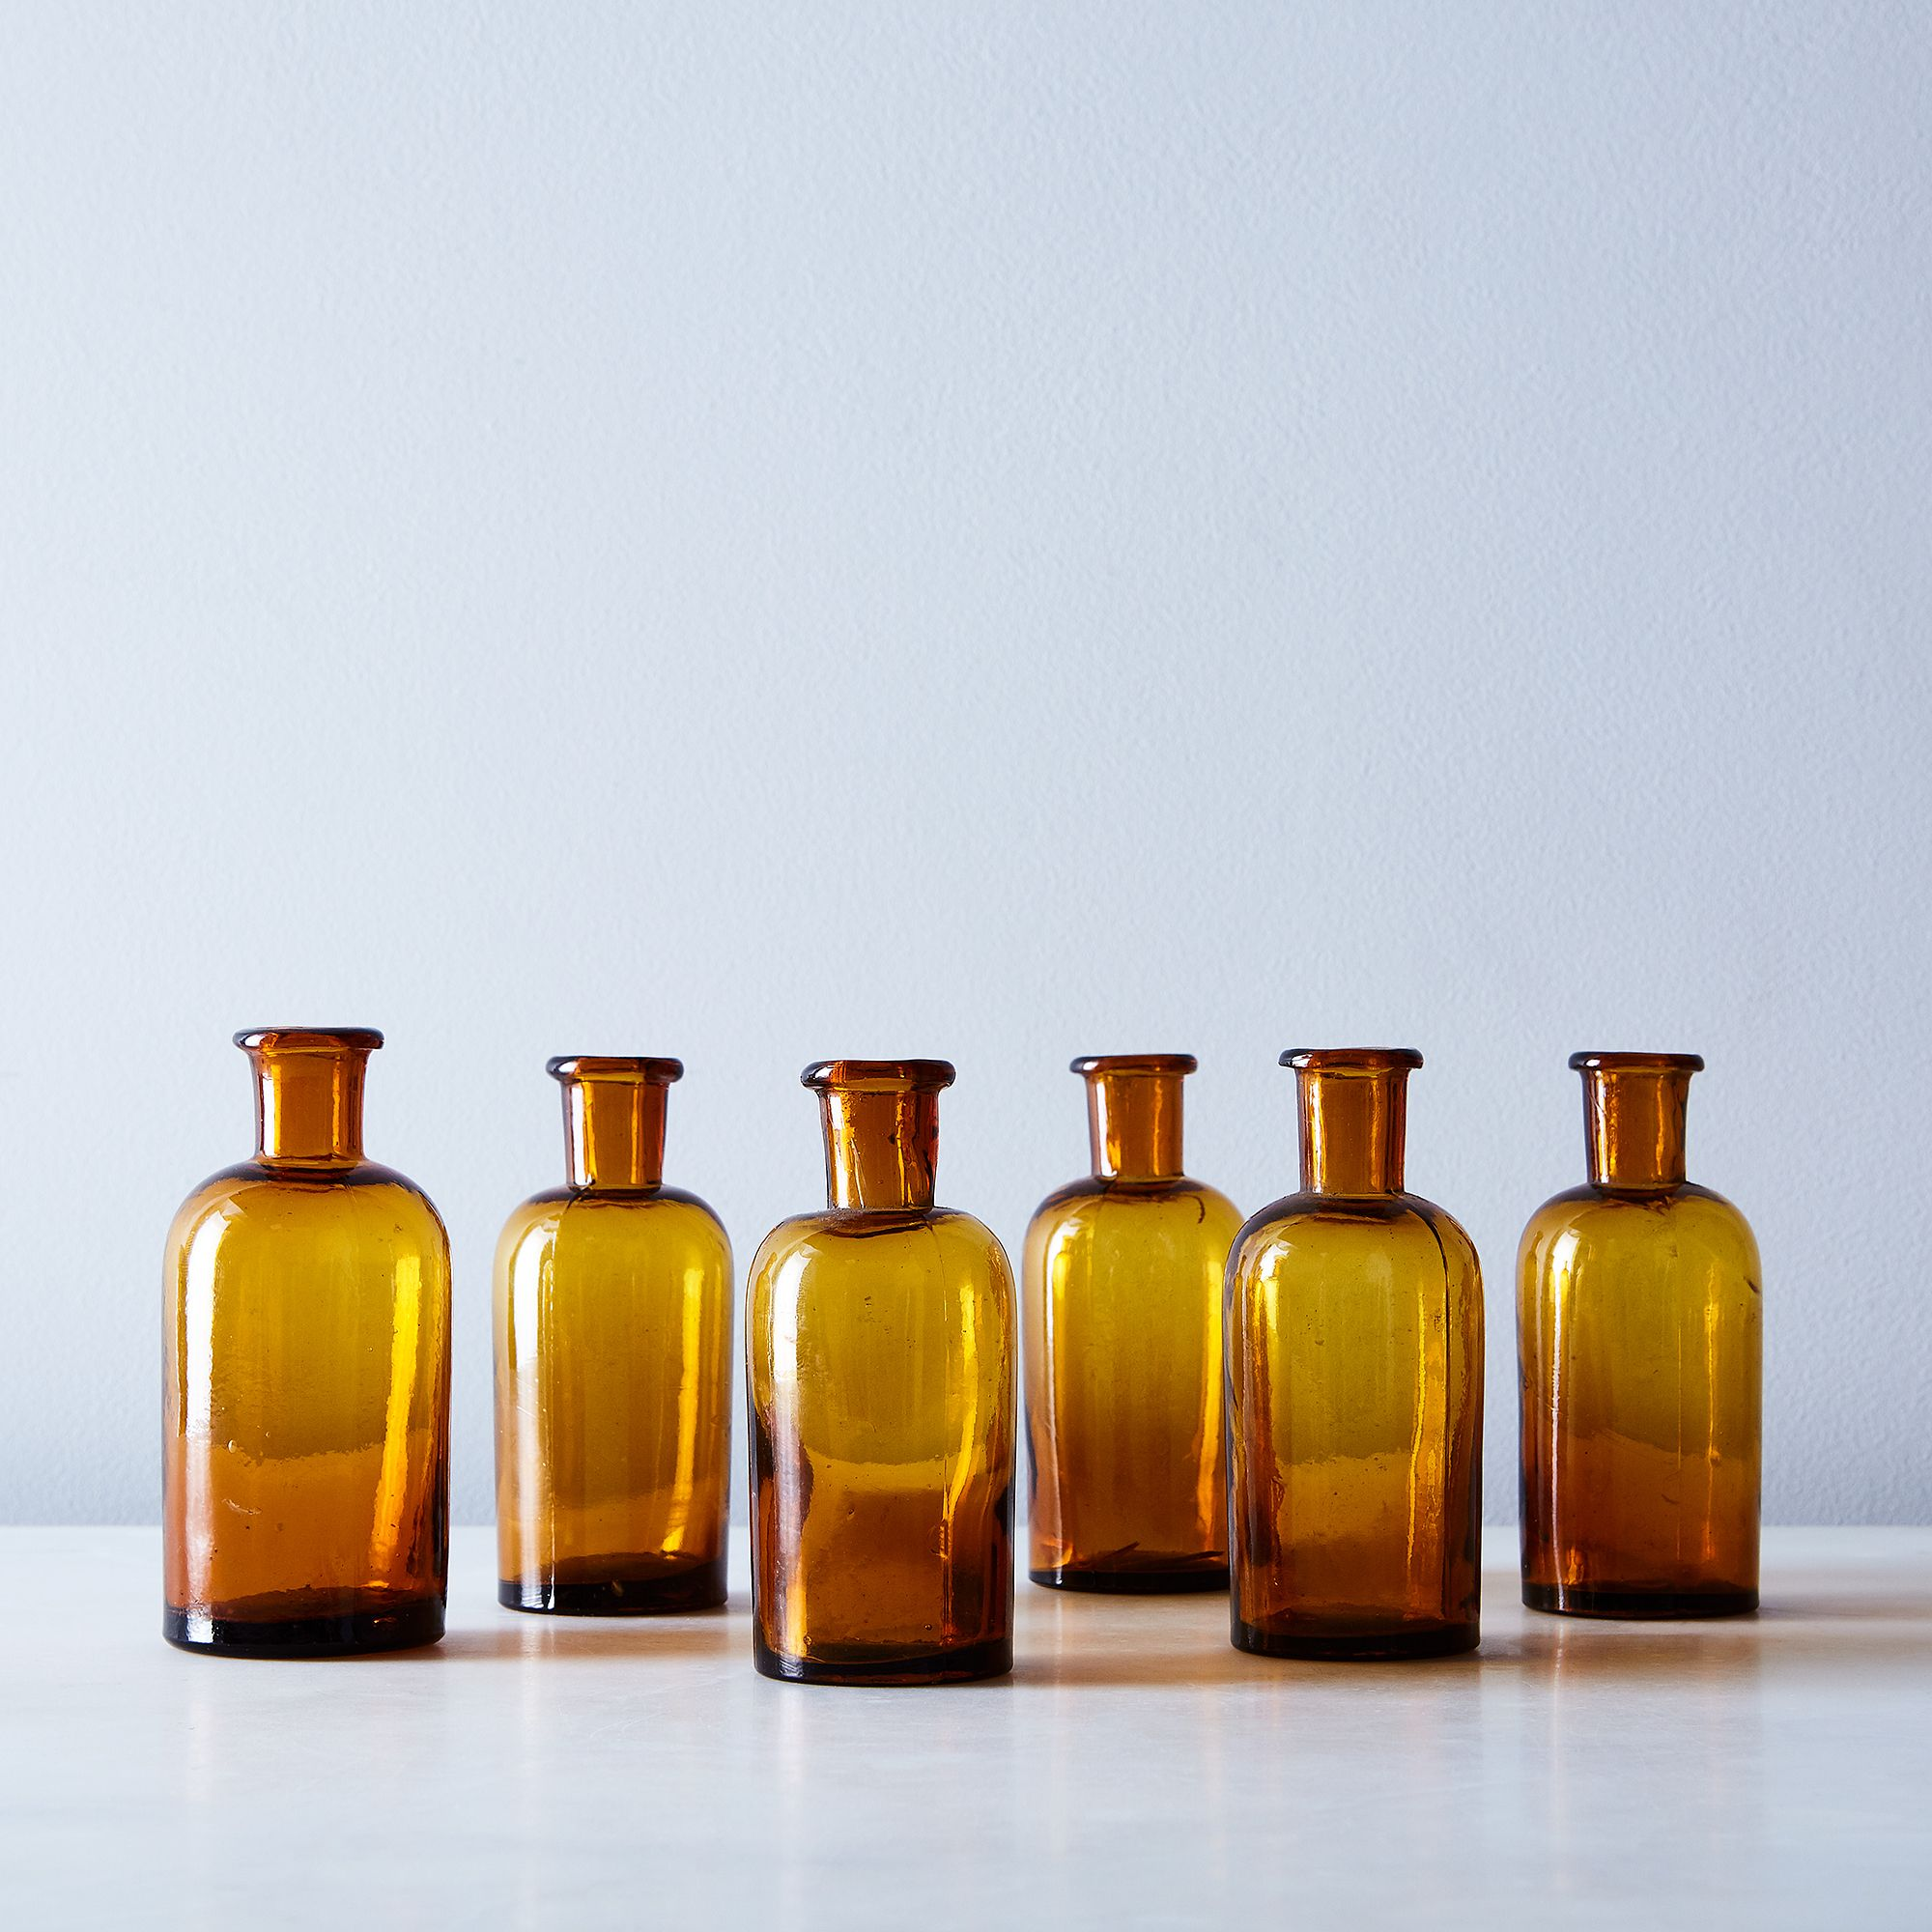 Eb4bb20d 9229 4a72 8712 da1632836016  2017 0609 food52 vintage shop vintage small amber apothecary jars set of 6 silo rocky luten 012